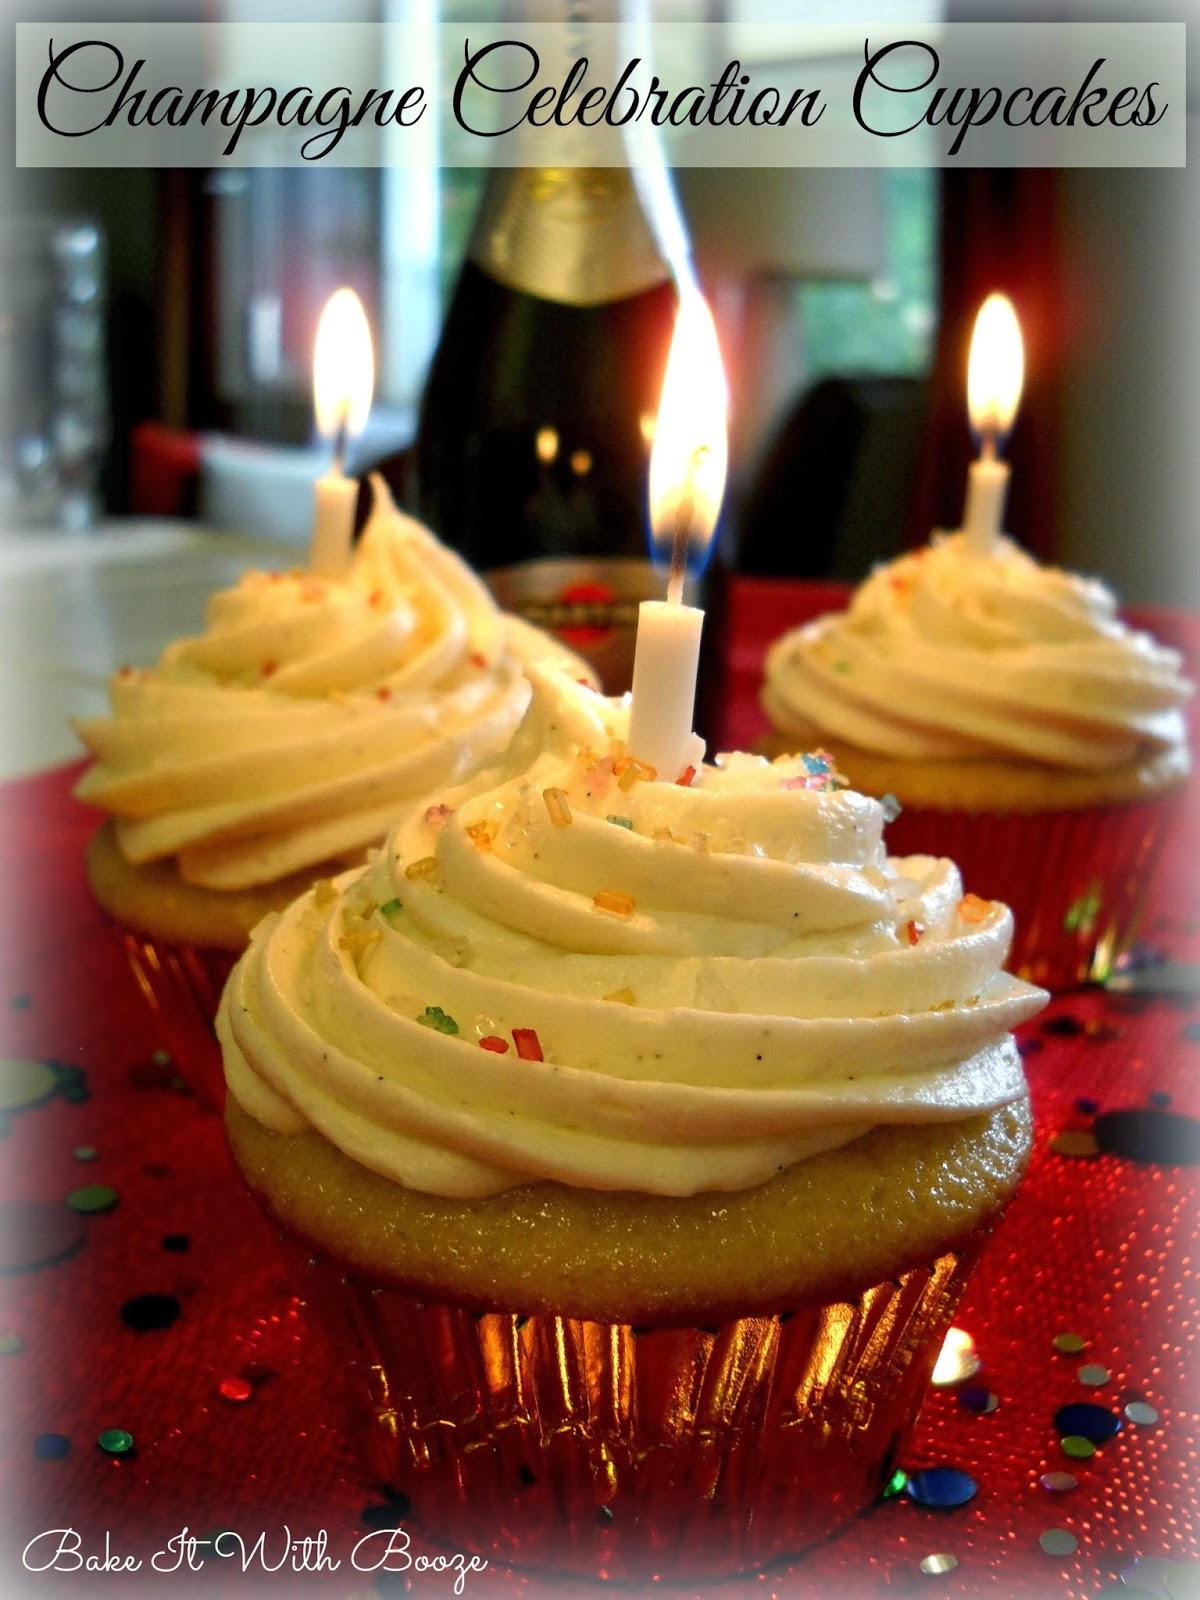 Pretty and festive: Make champagne celebration cupcakes (with vanilla champagne filling)